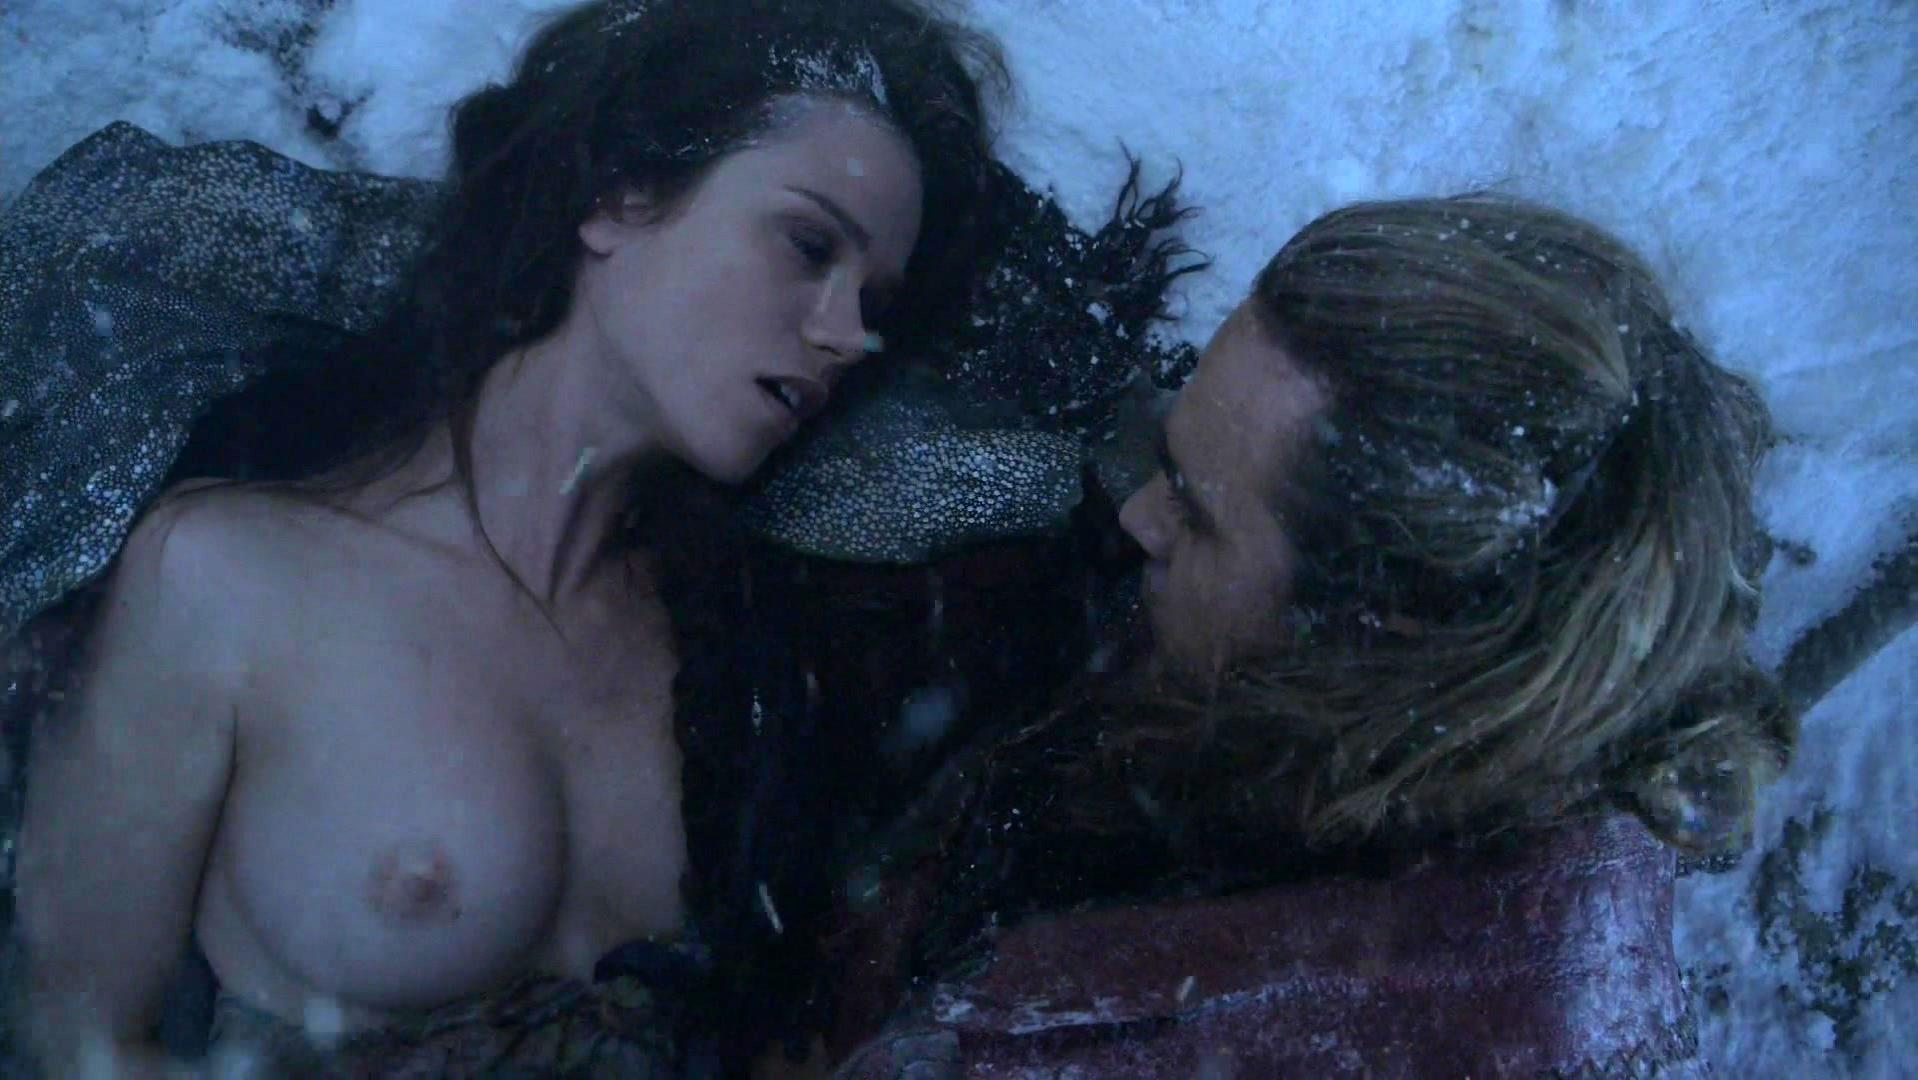 Gwendoline Taylor nude - Spartacus s03e07 (2013)